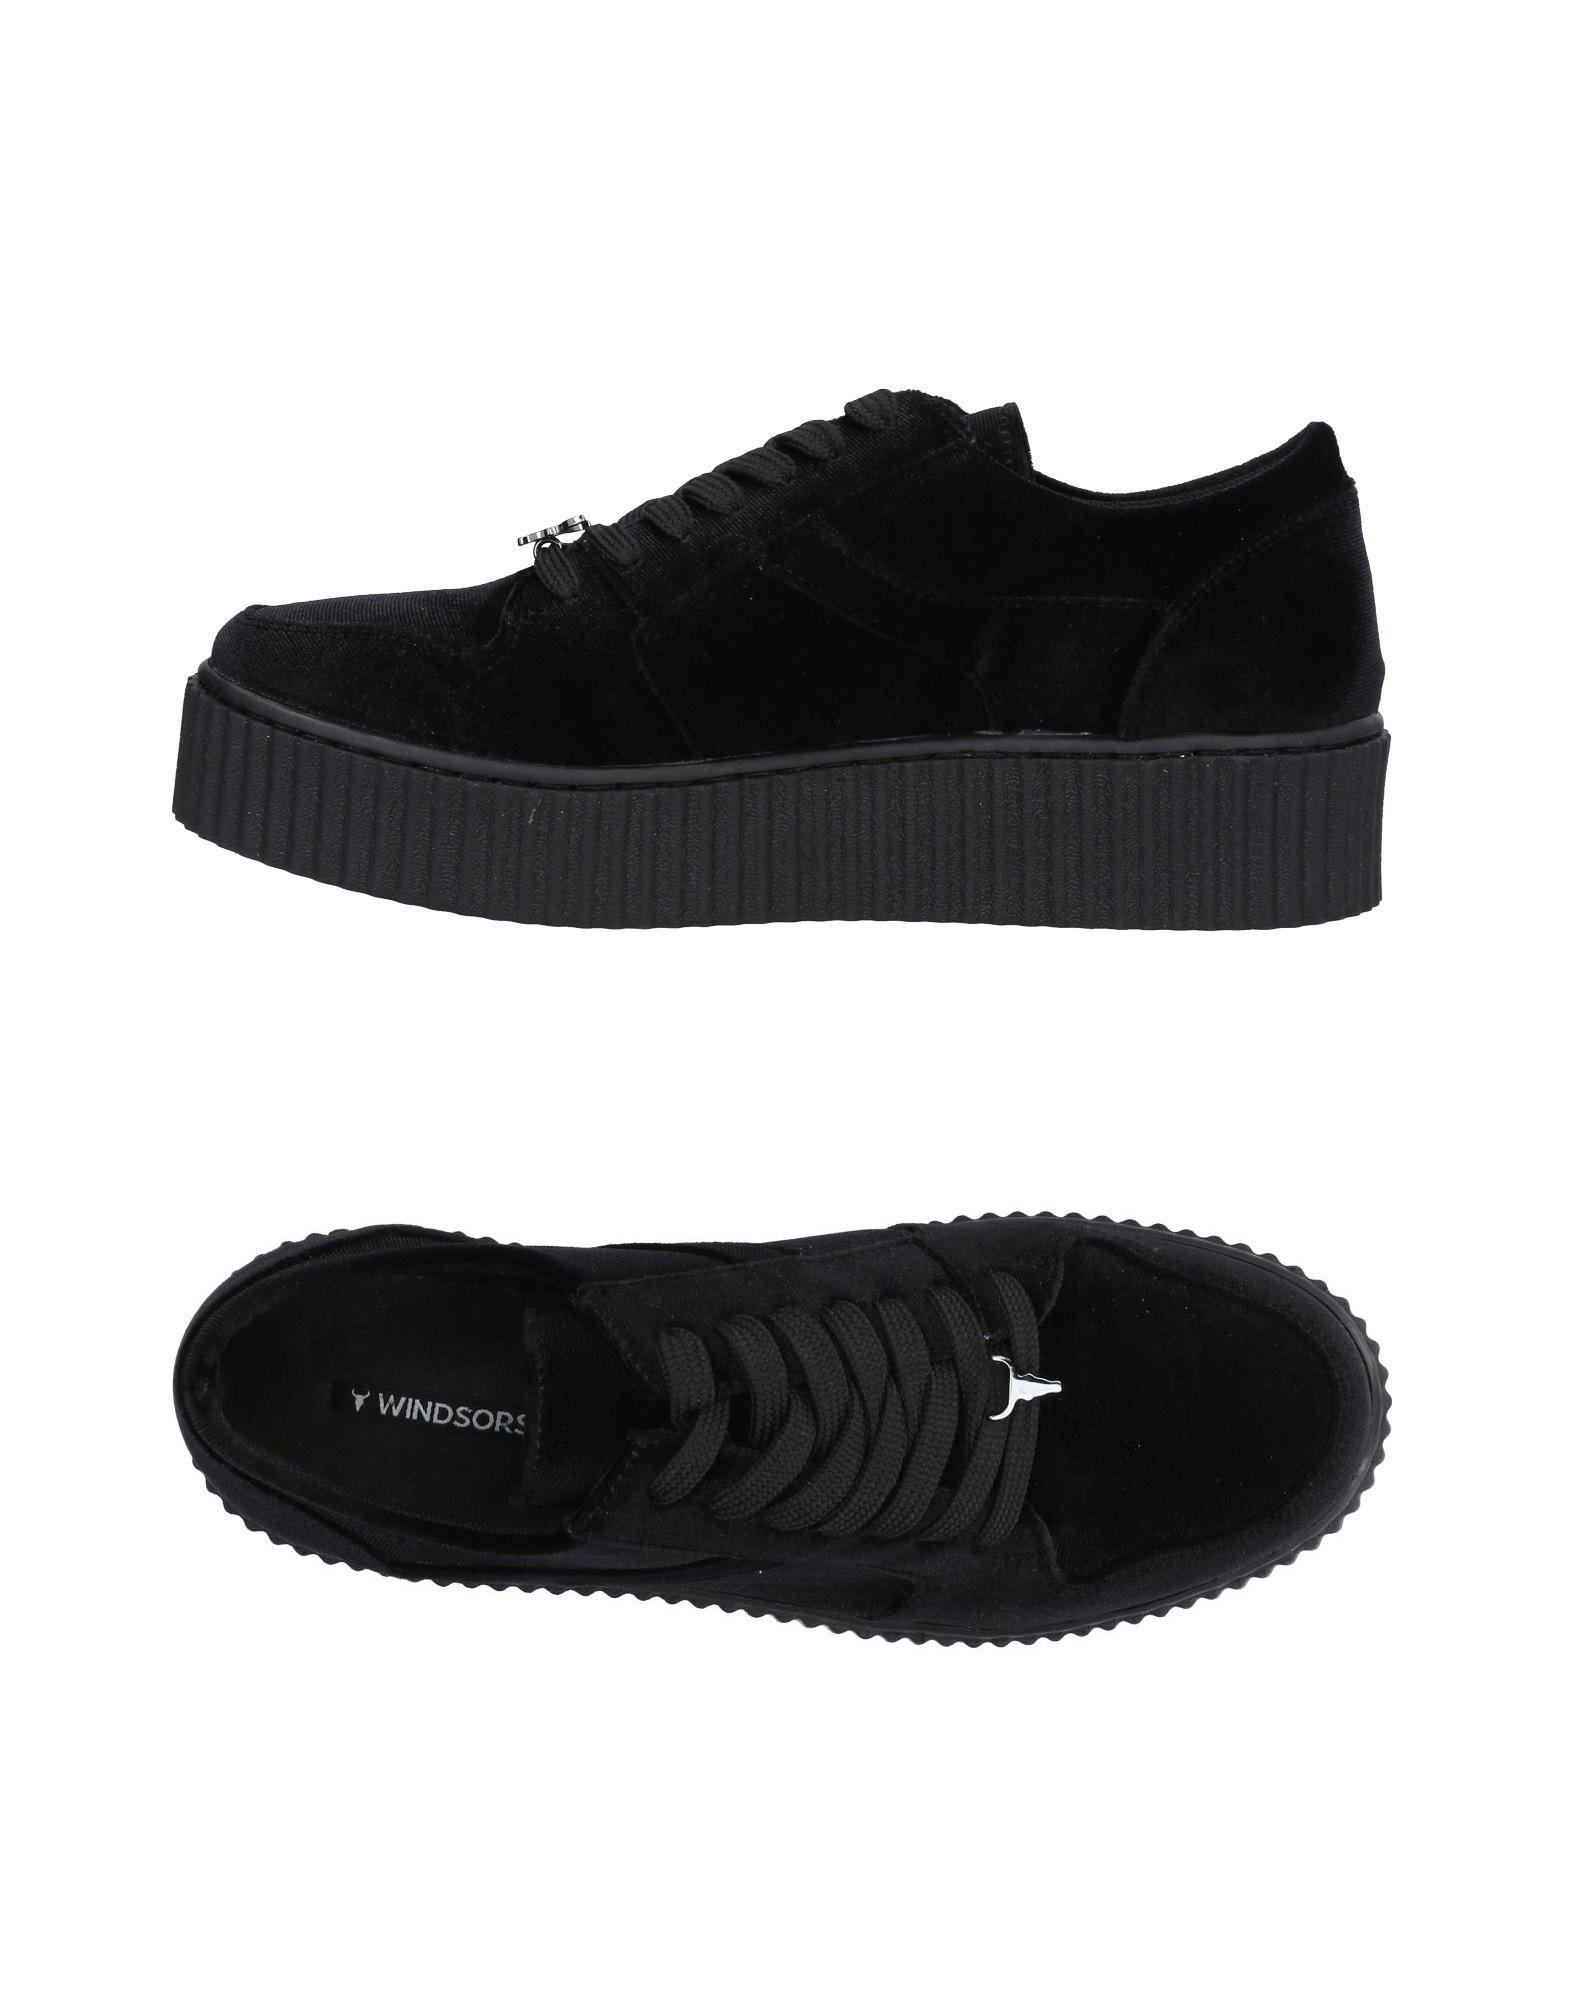 WINDSOR SMITH Низкие кеды и кроссовки кеды кроссовки высокие dc evan smith hi black